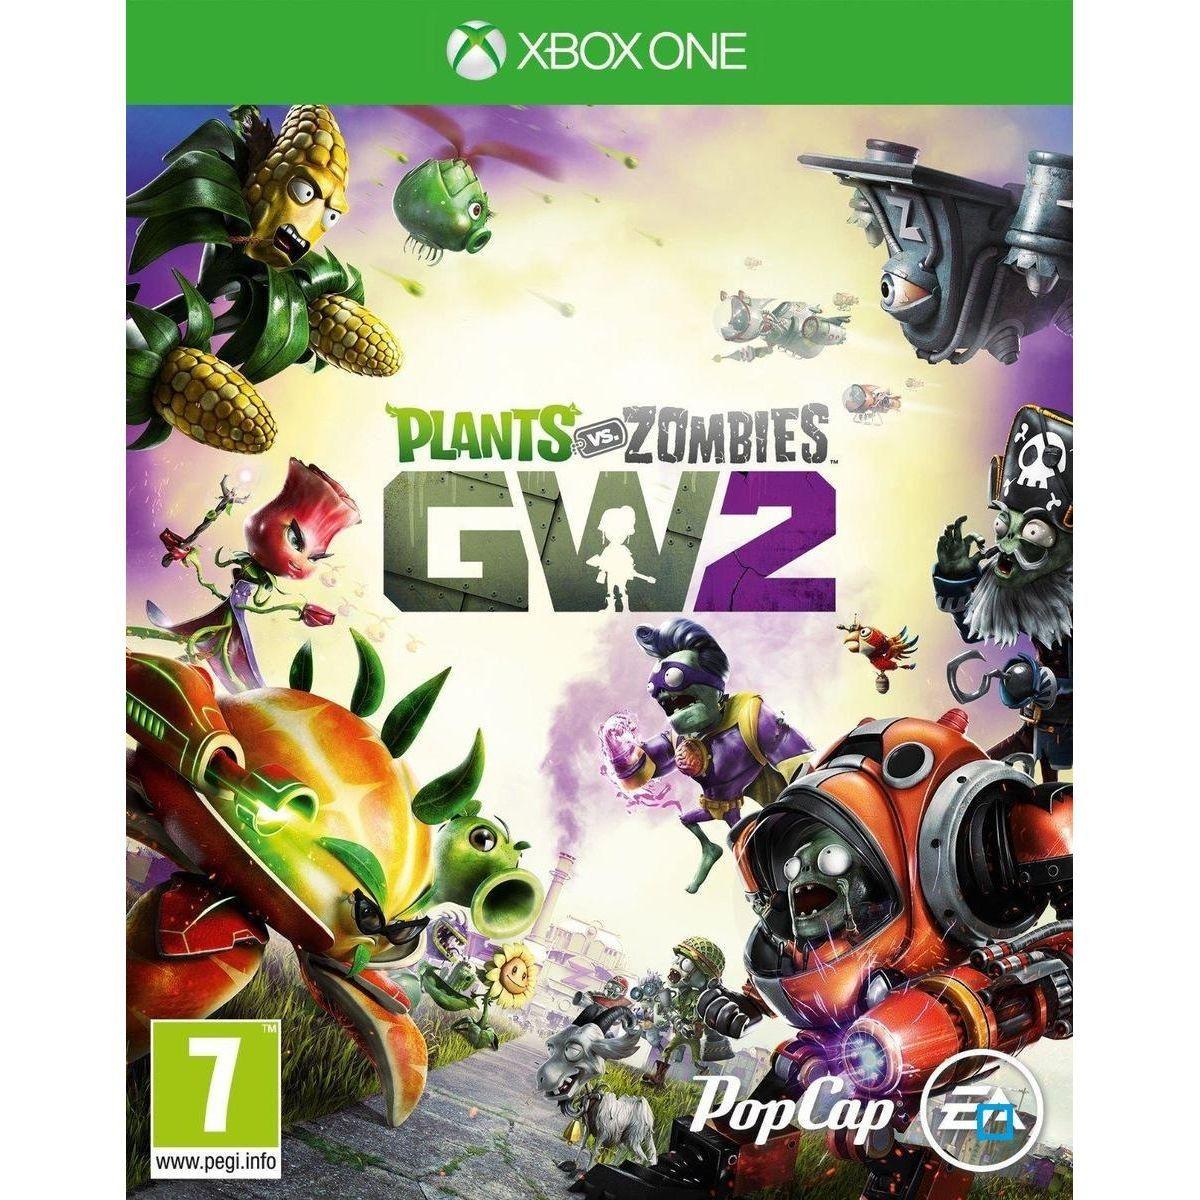 Pin De Lucas Ii Em Jogos Xbox Jogos Xbox One Plantas Vs Zumbis Xbox